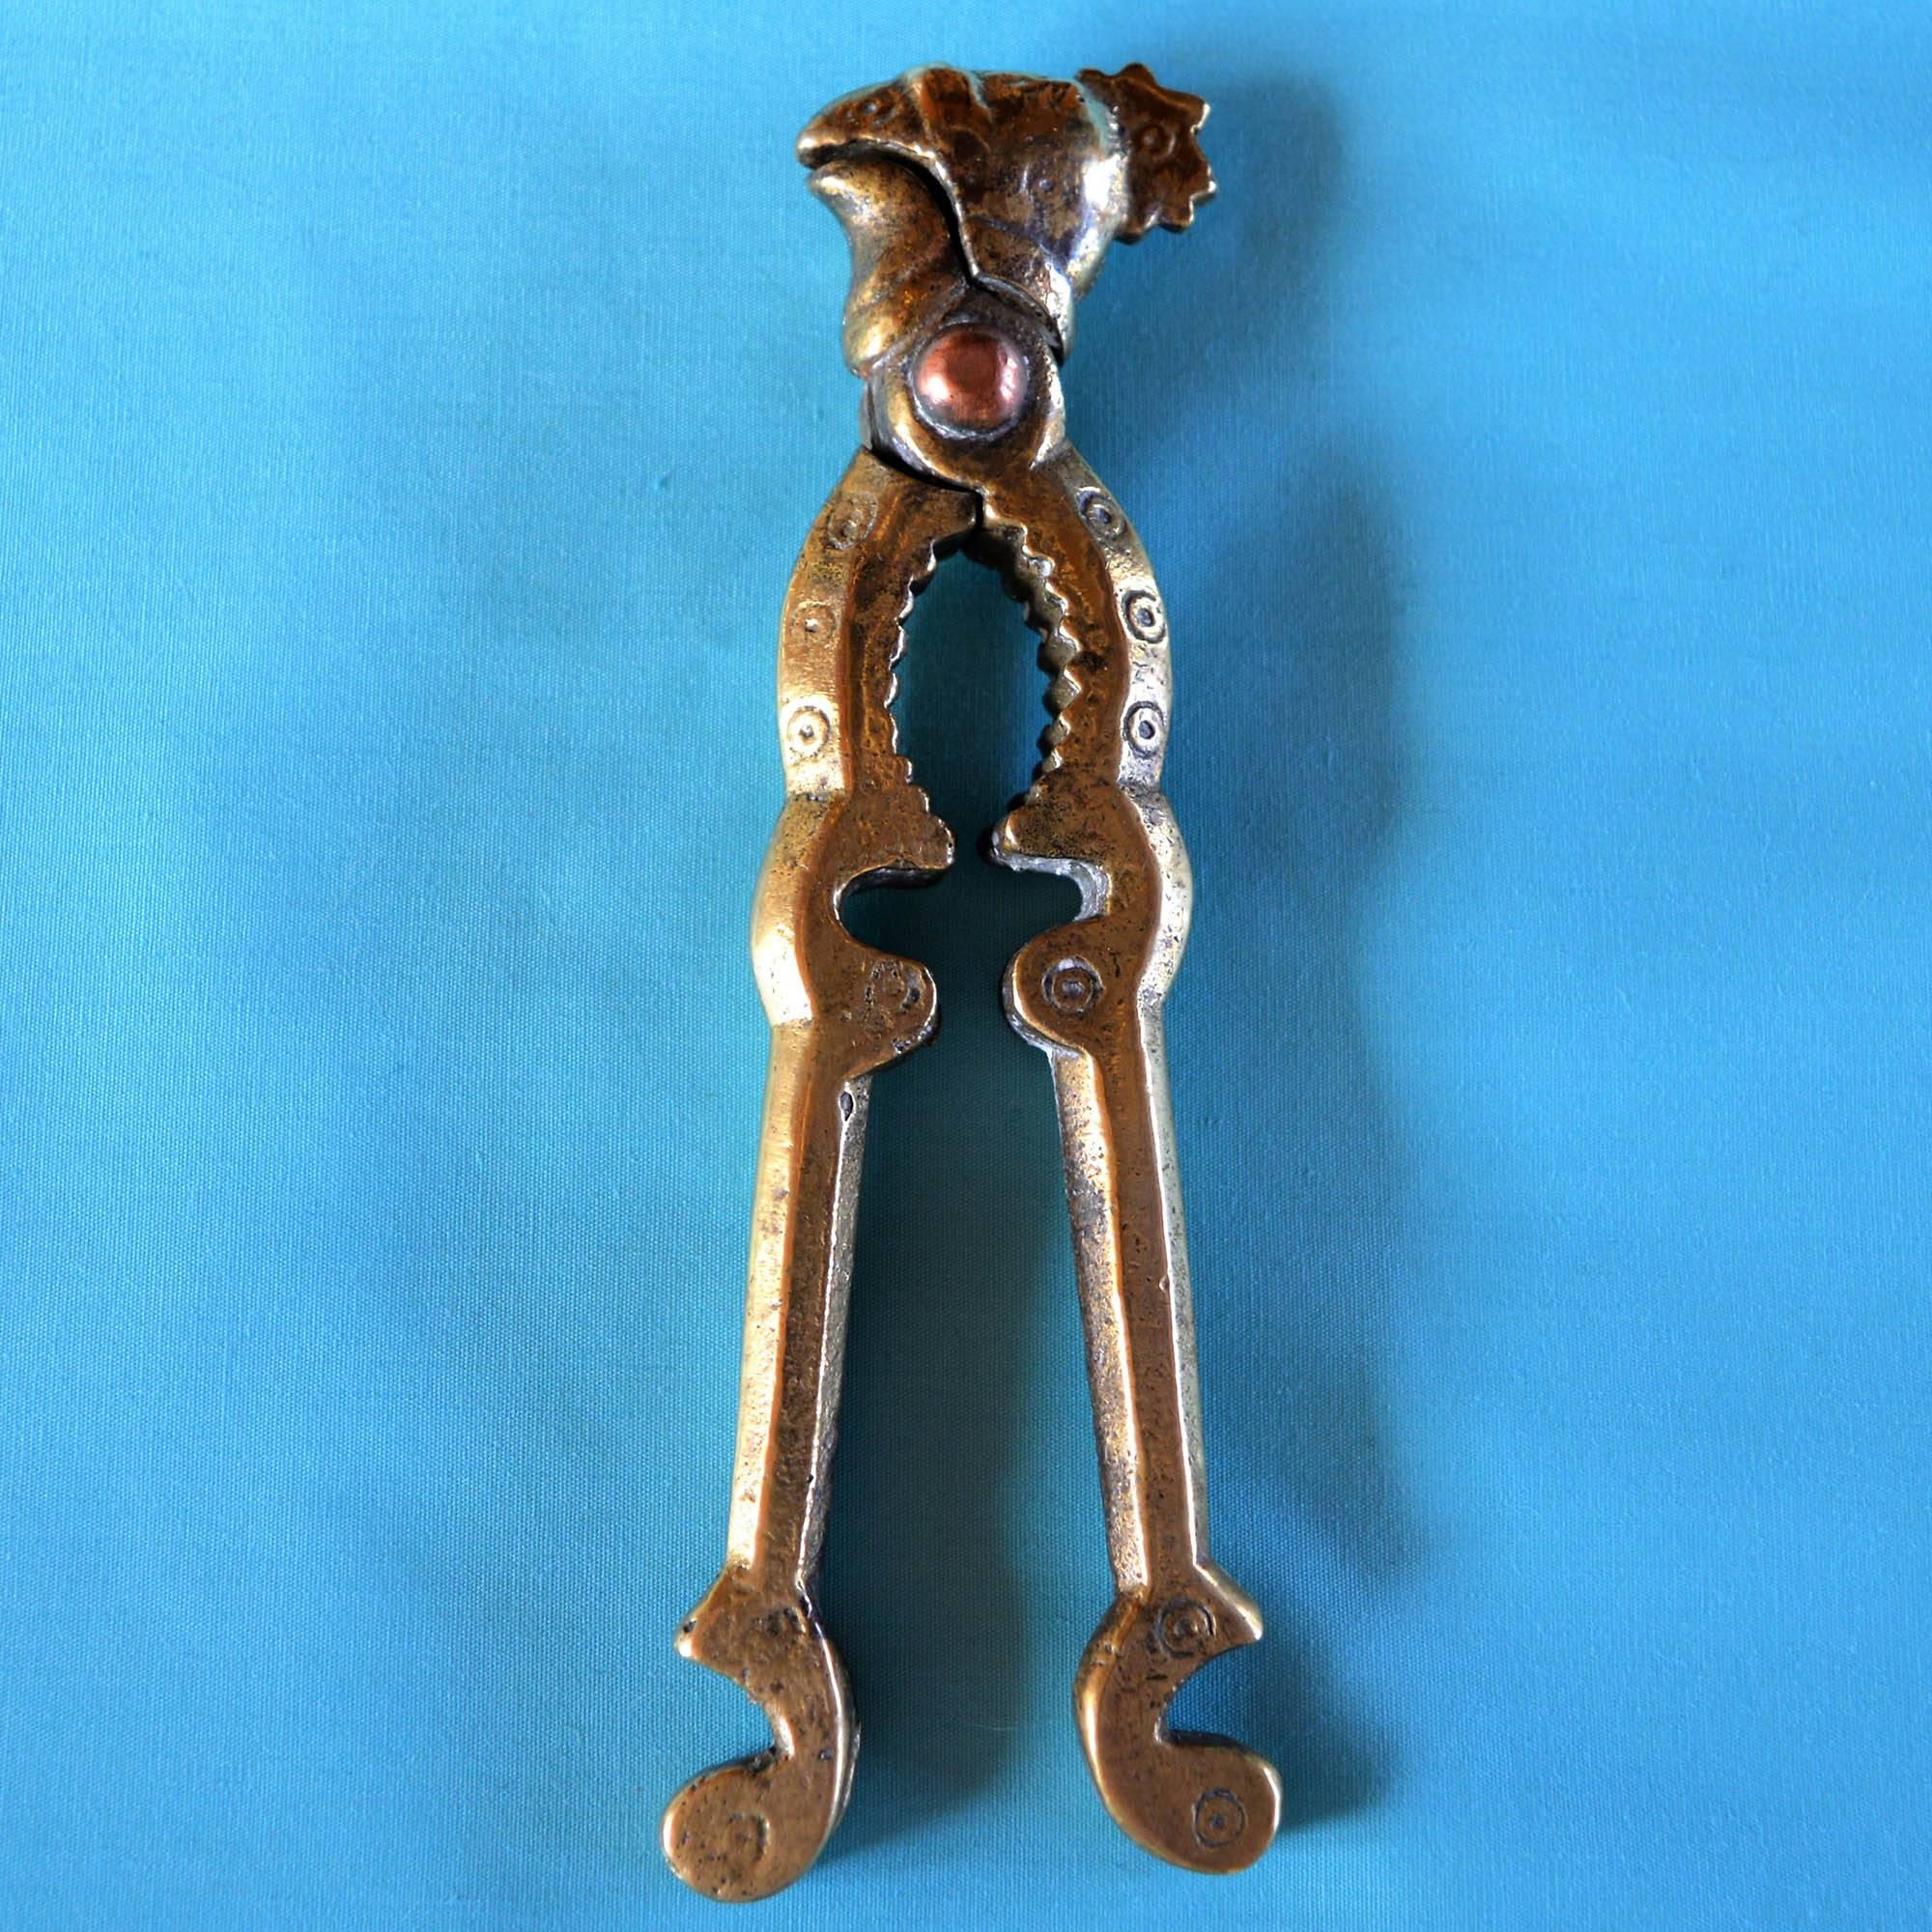 Antique Rooster Nutcracker For Sale at 1stdibs